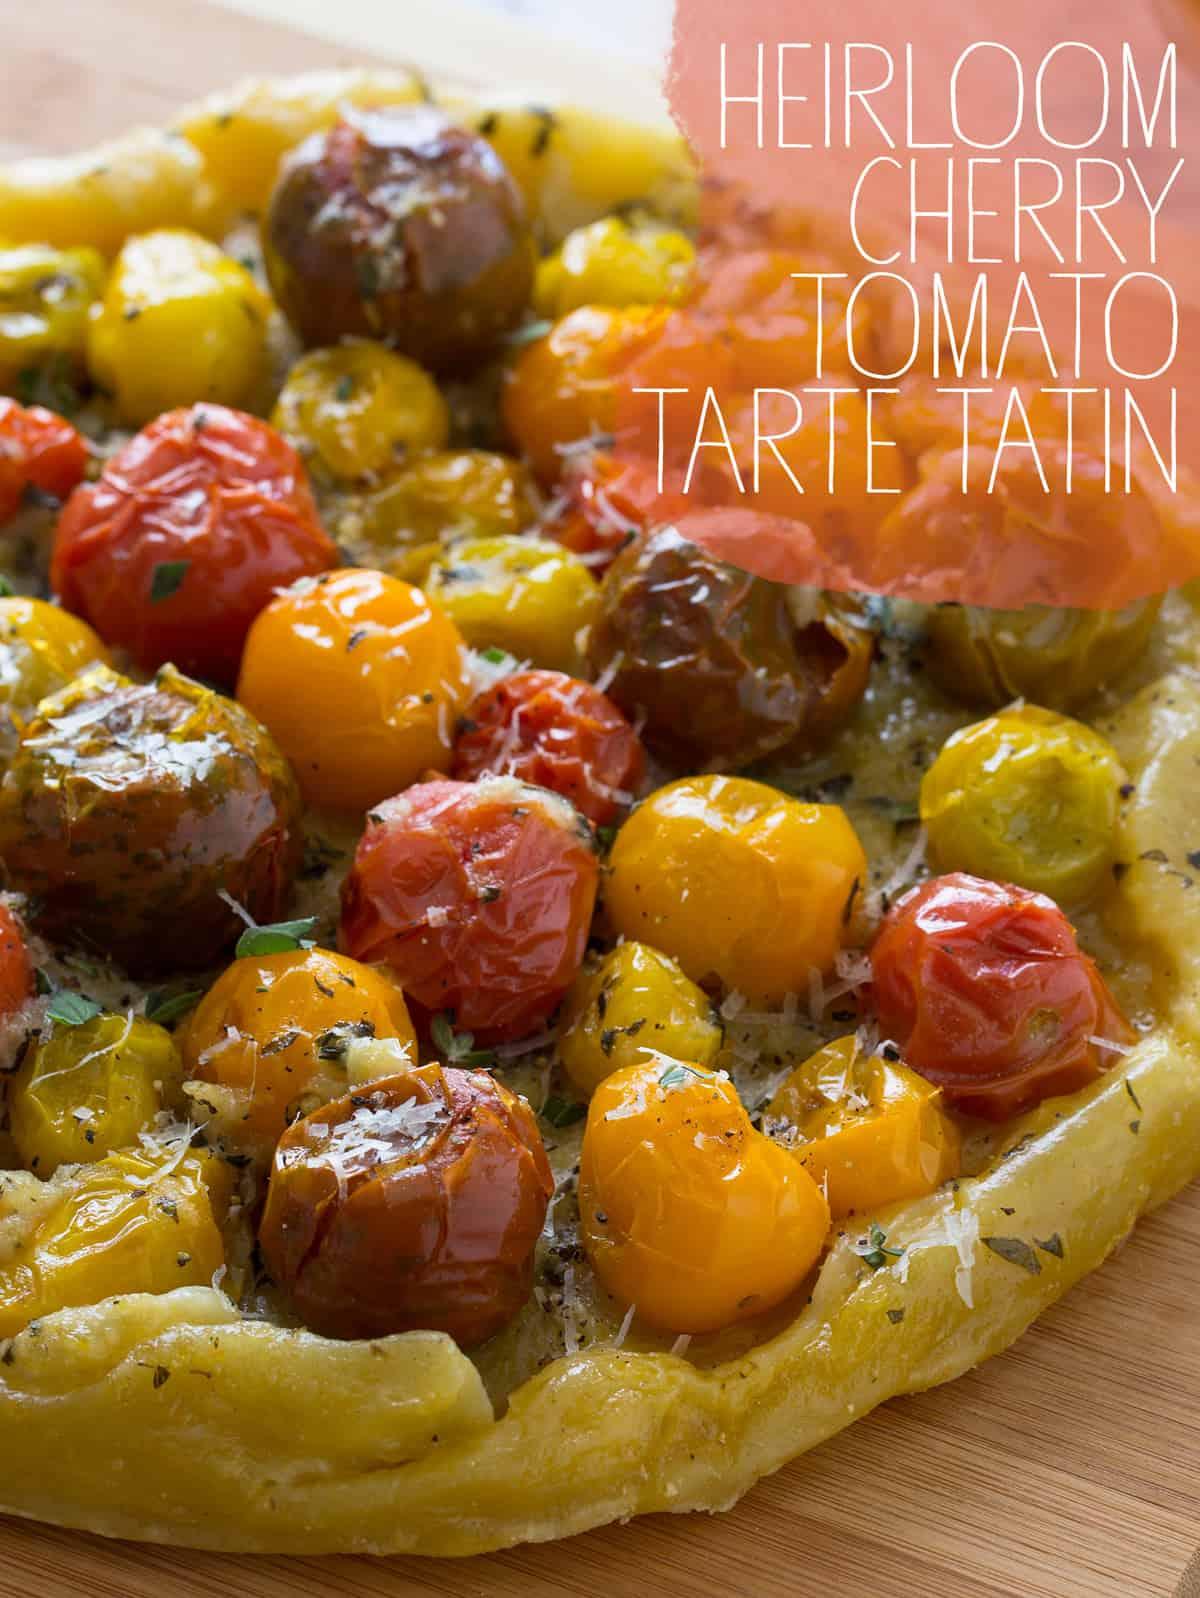 Heirloom Cherry Tomato Tarte Tatin | Spoon Fork Bacon